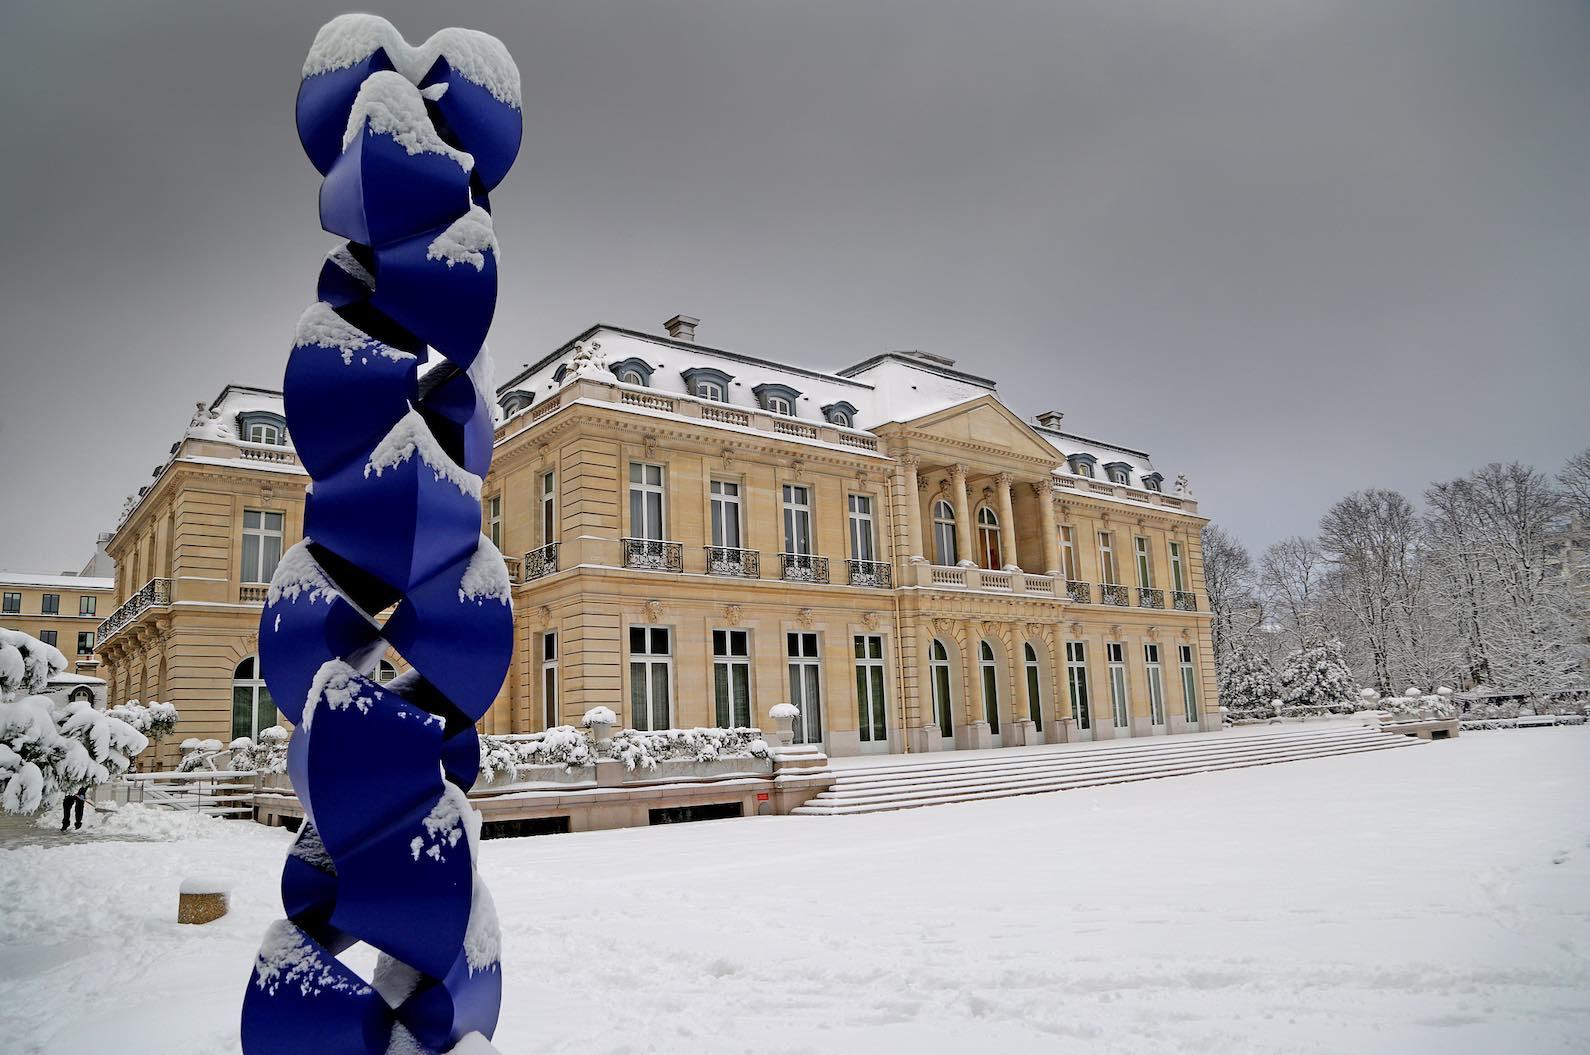 OECD headquarters in Paris (Hervé Cortinat/OECD/Flickr)